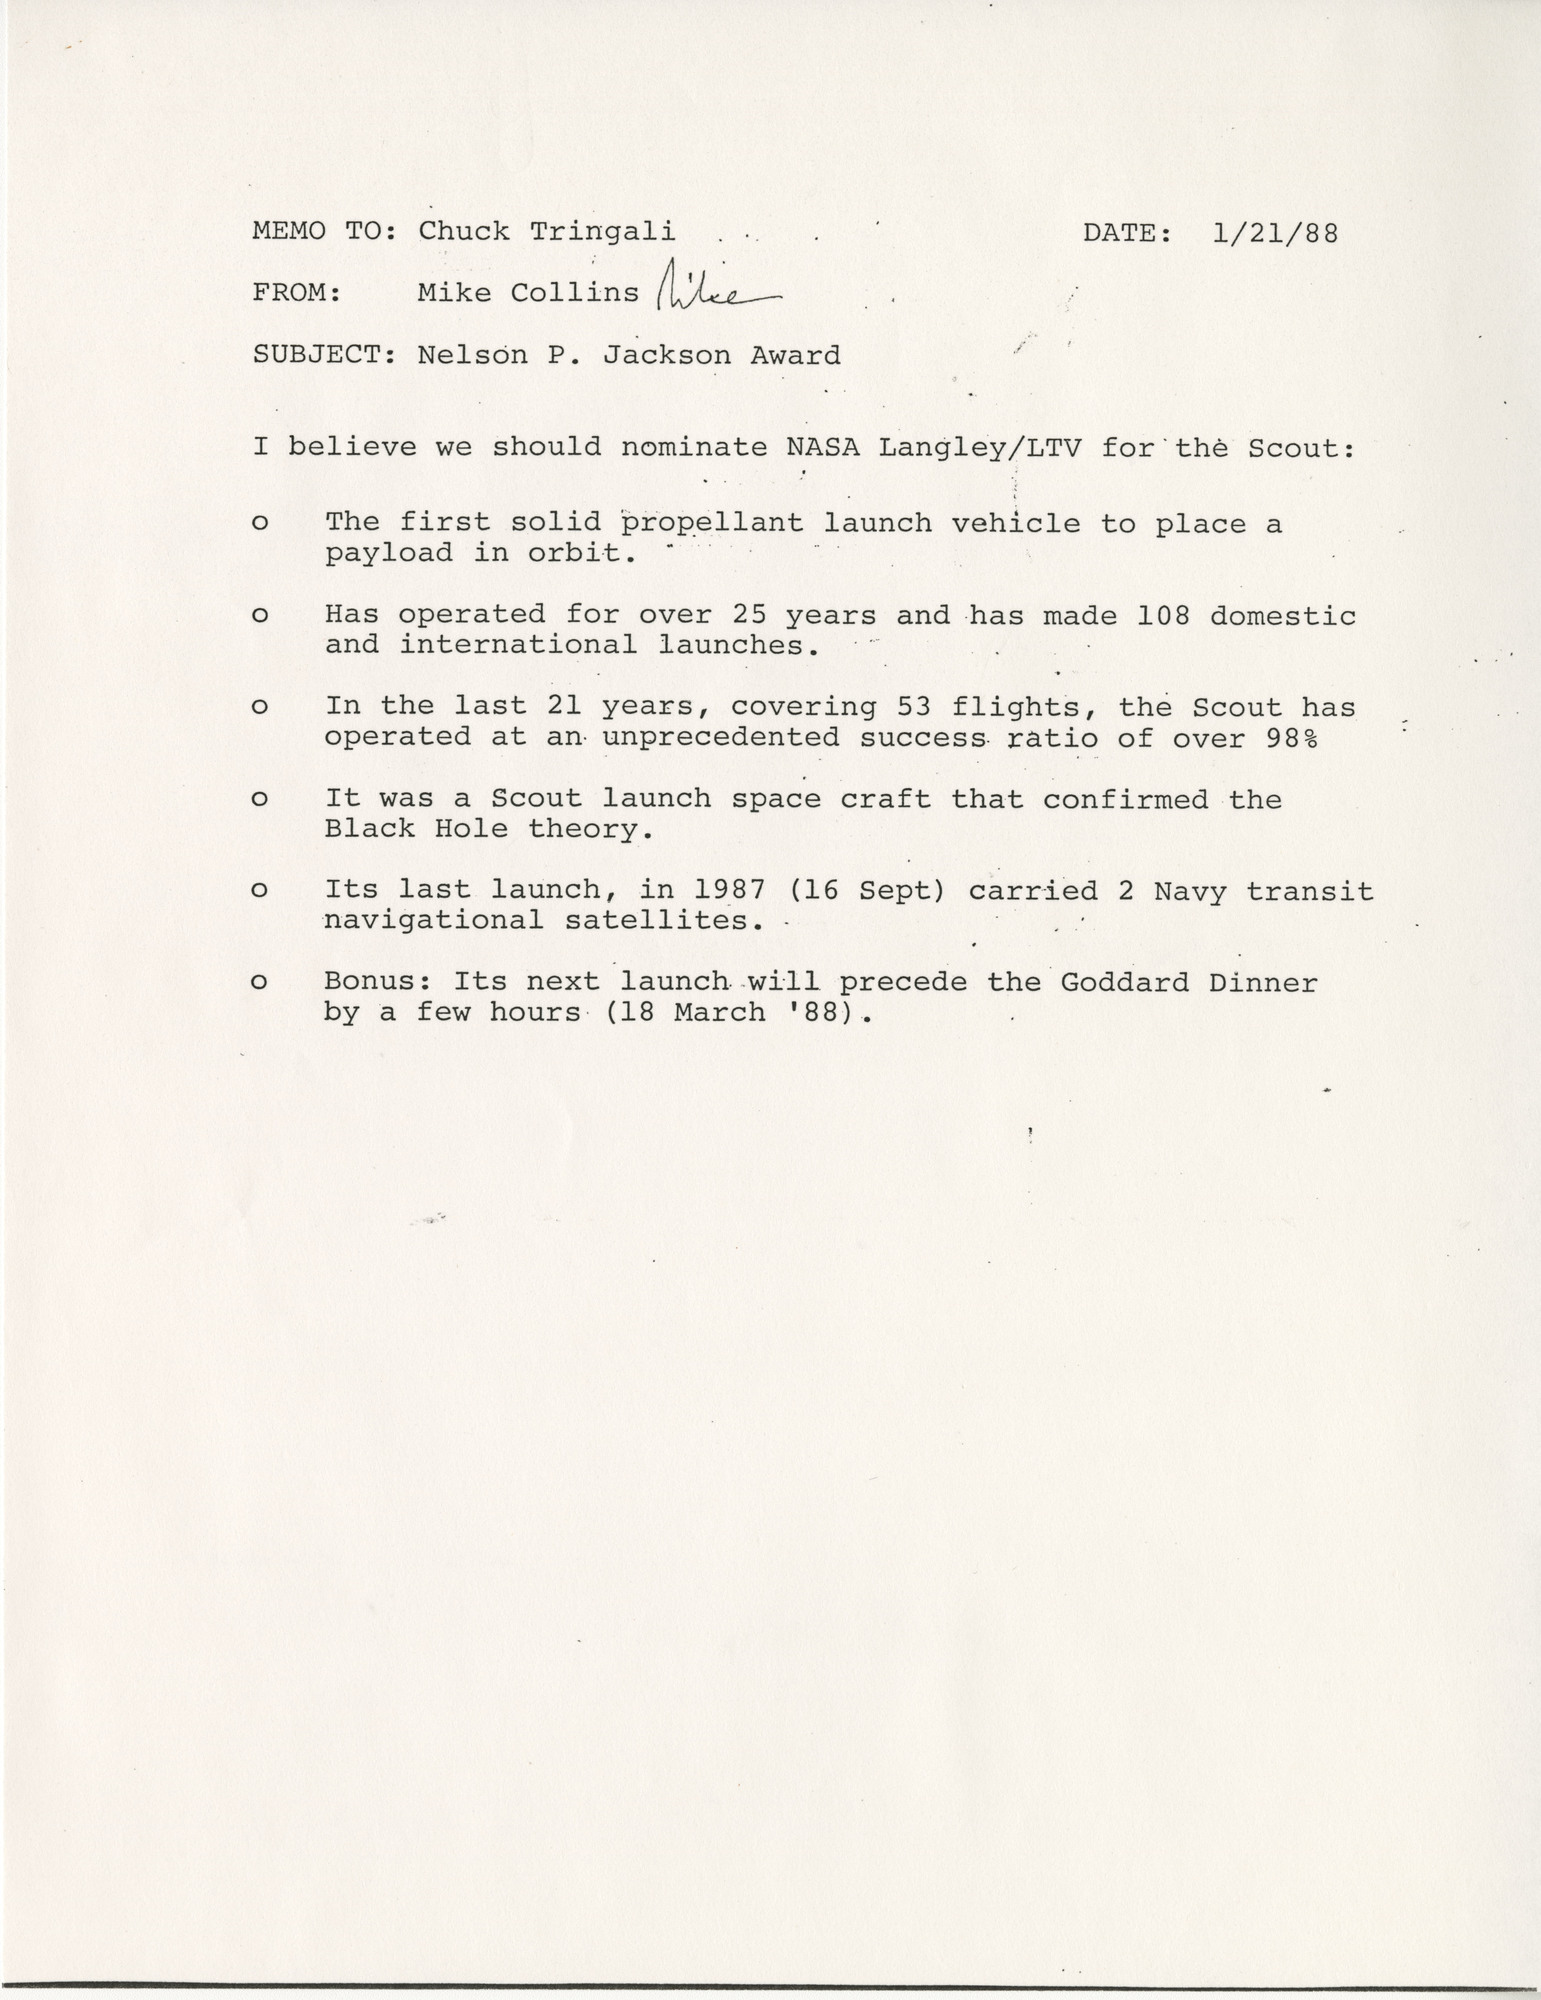 http://spec.lib.vt.edu/pickup/Omeka_upload/Ms1989-029_B19_F12_Correspondence_1988_0121.jpg